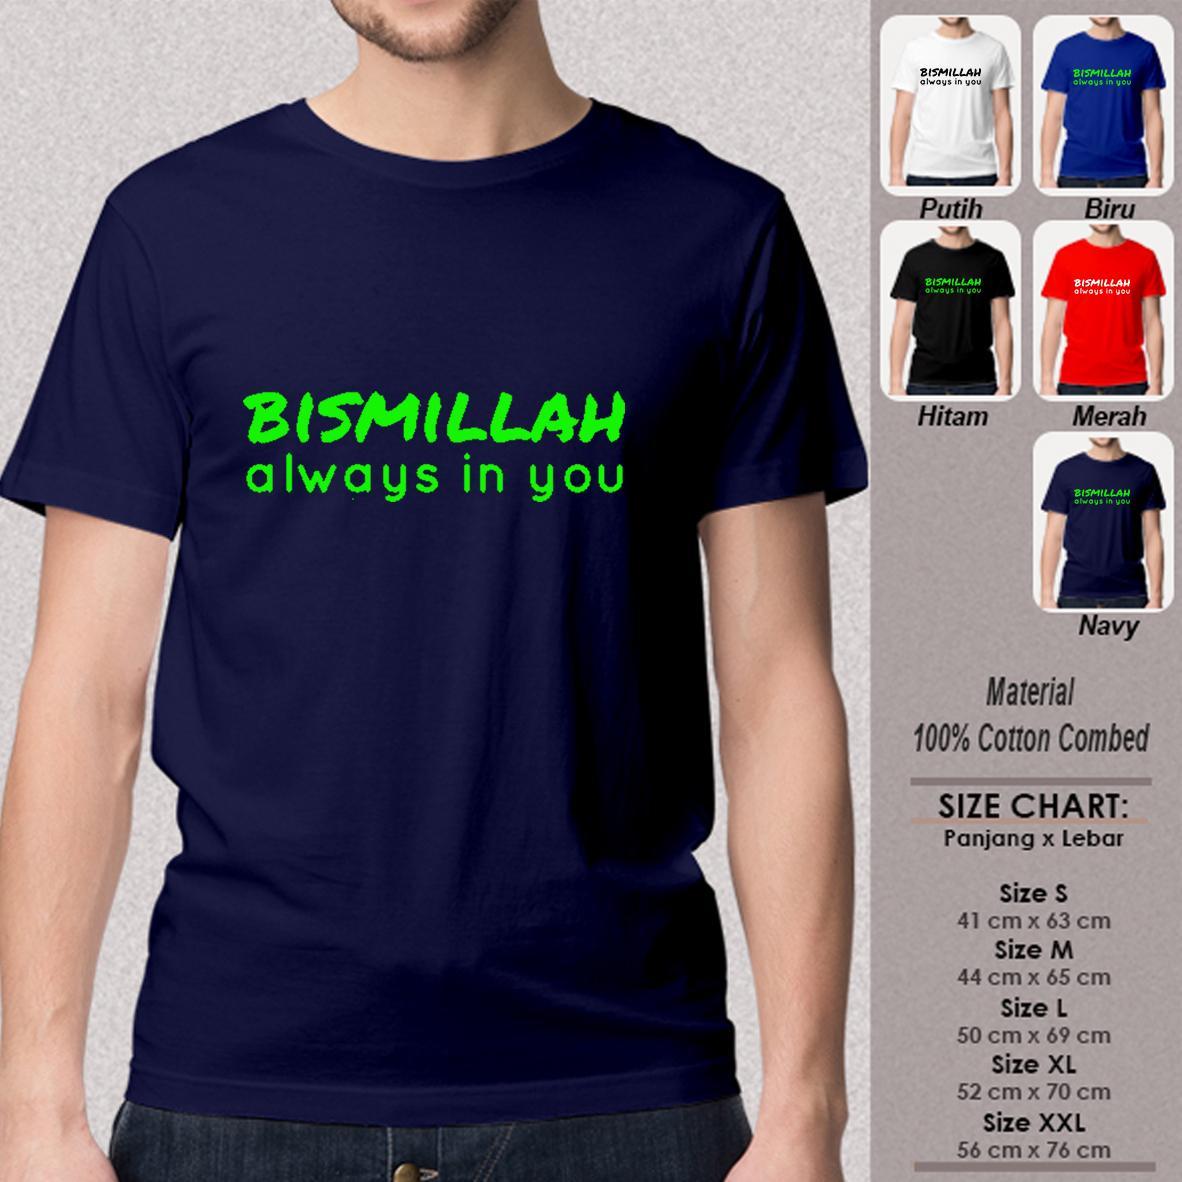 Harga Sala M Pashmina Instan Rp 17000 Size Suppliernatgeo Kaos T Shirt Distro Pria Tshirt